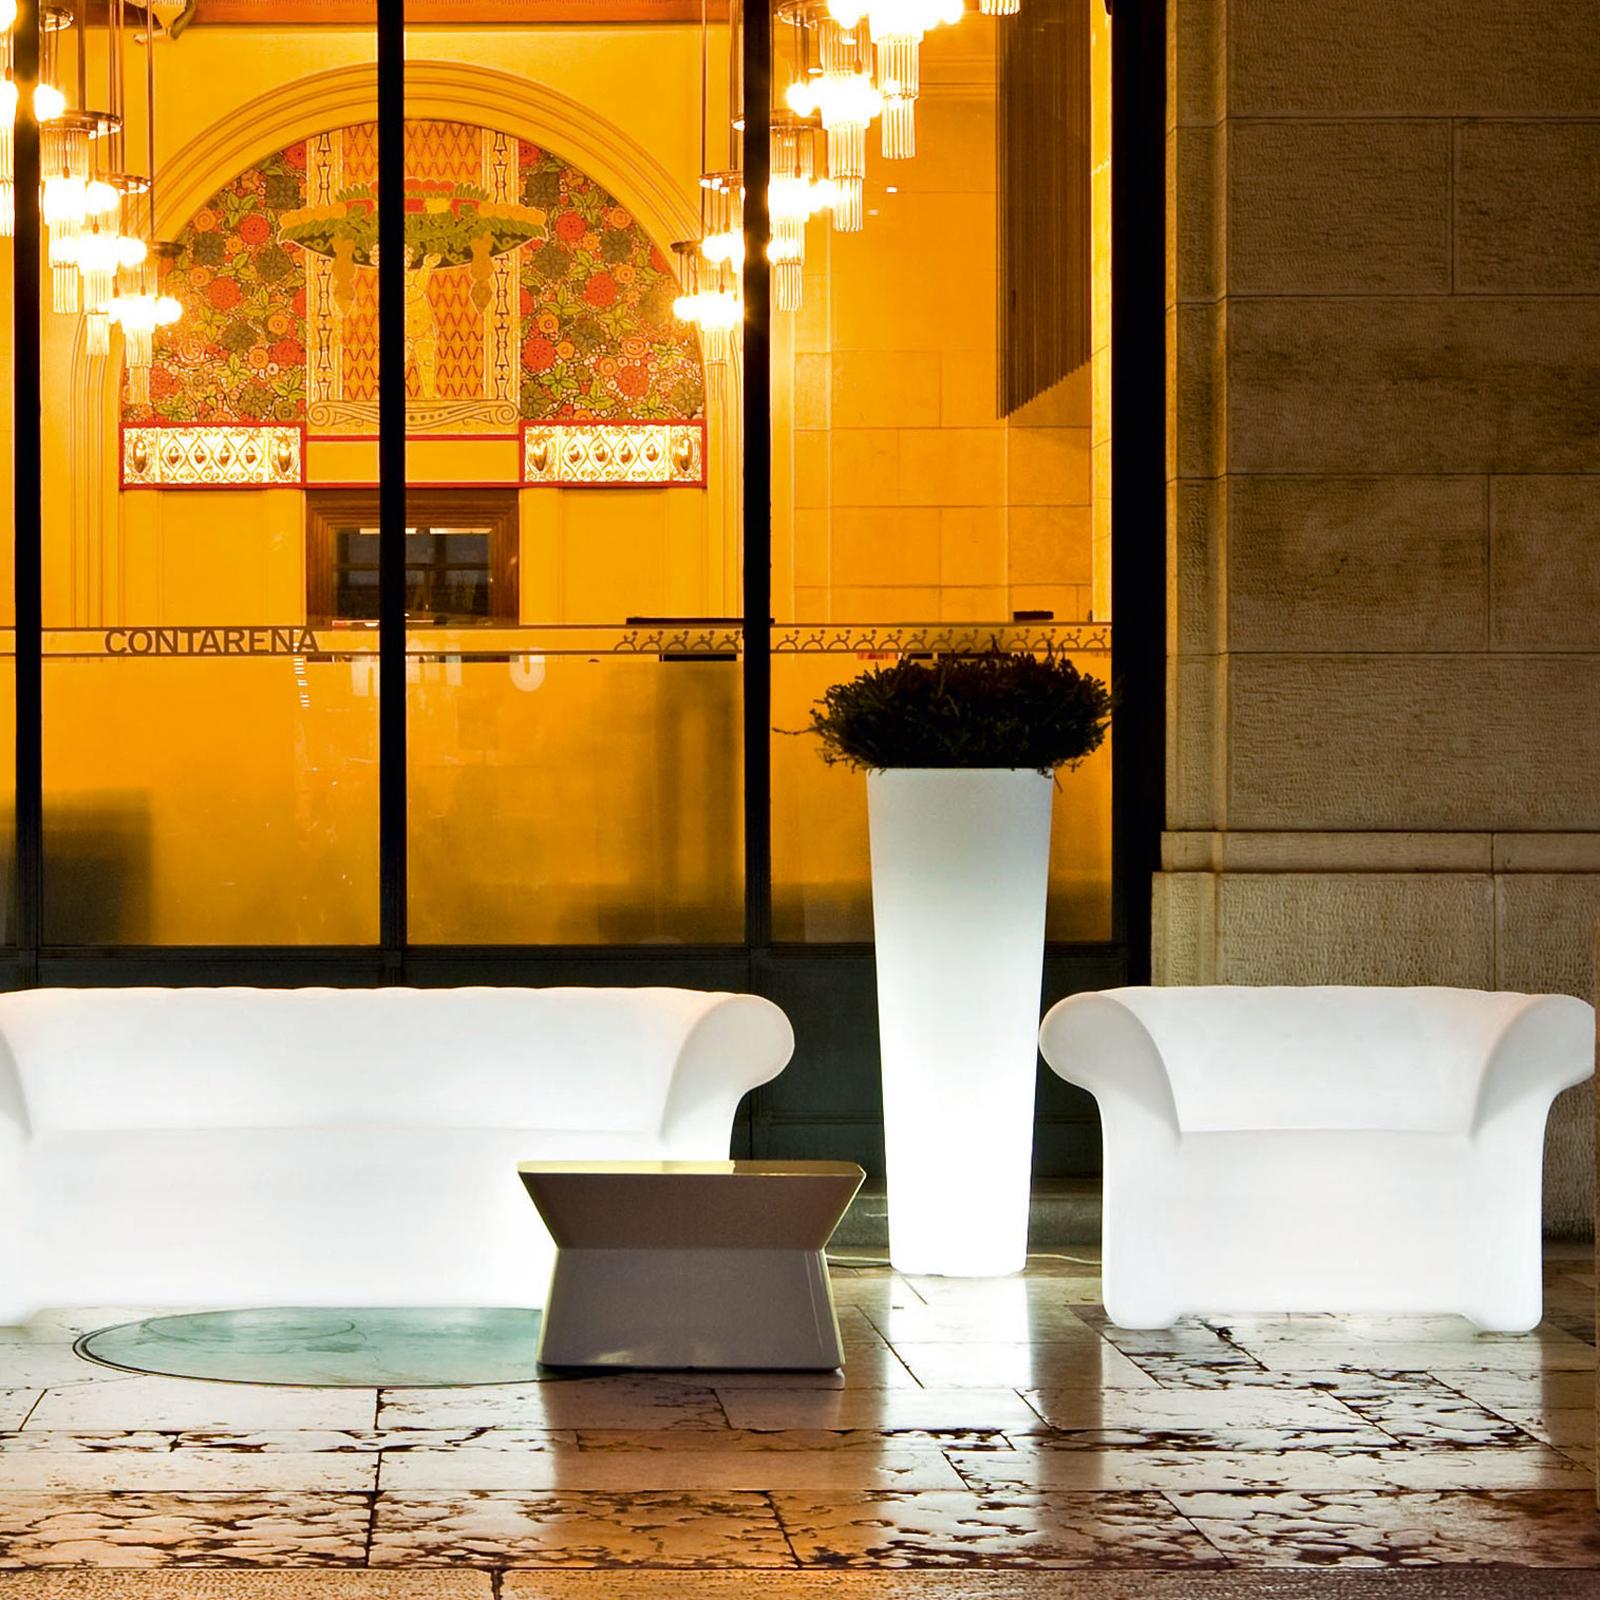 Sirchester armchair by serralunga core furniture online for Serralunga furniture